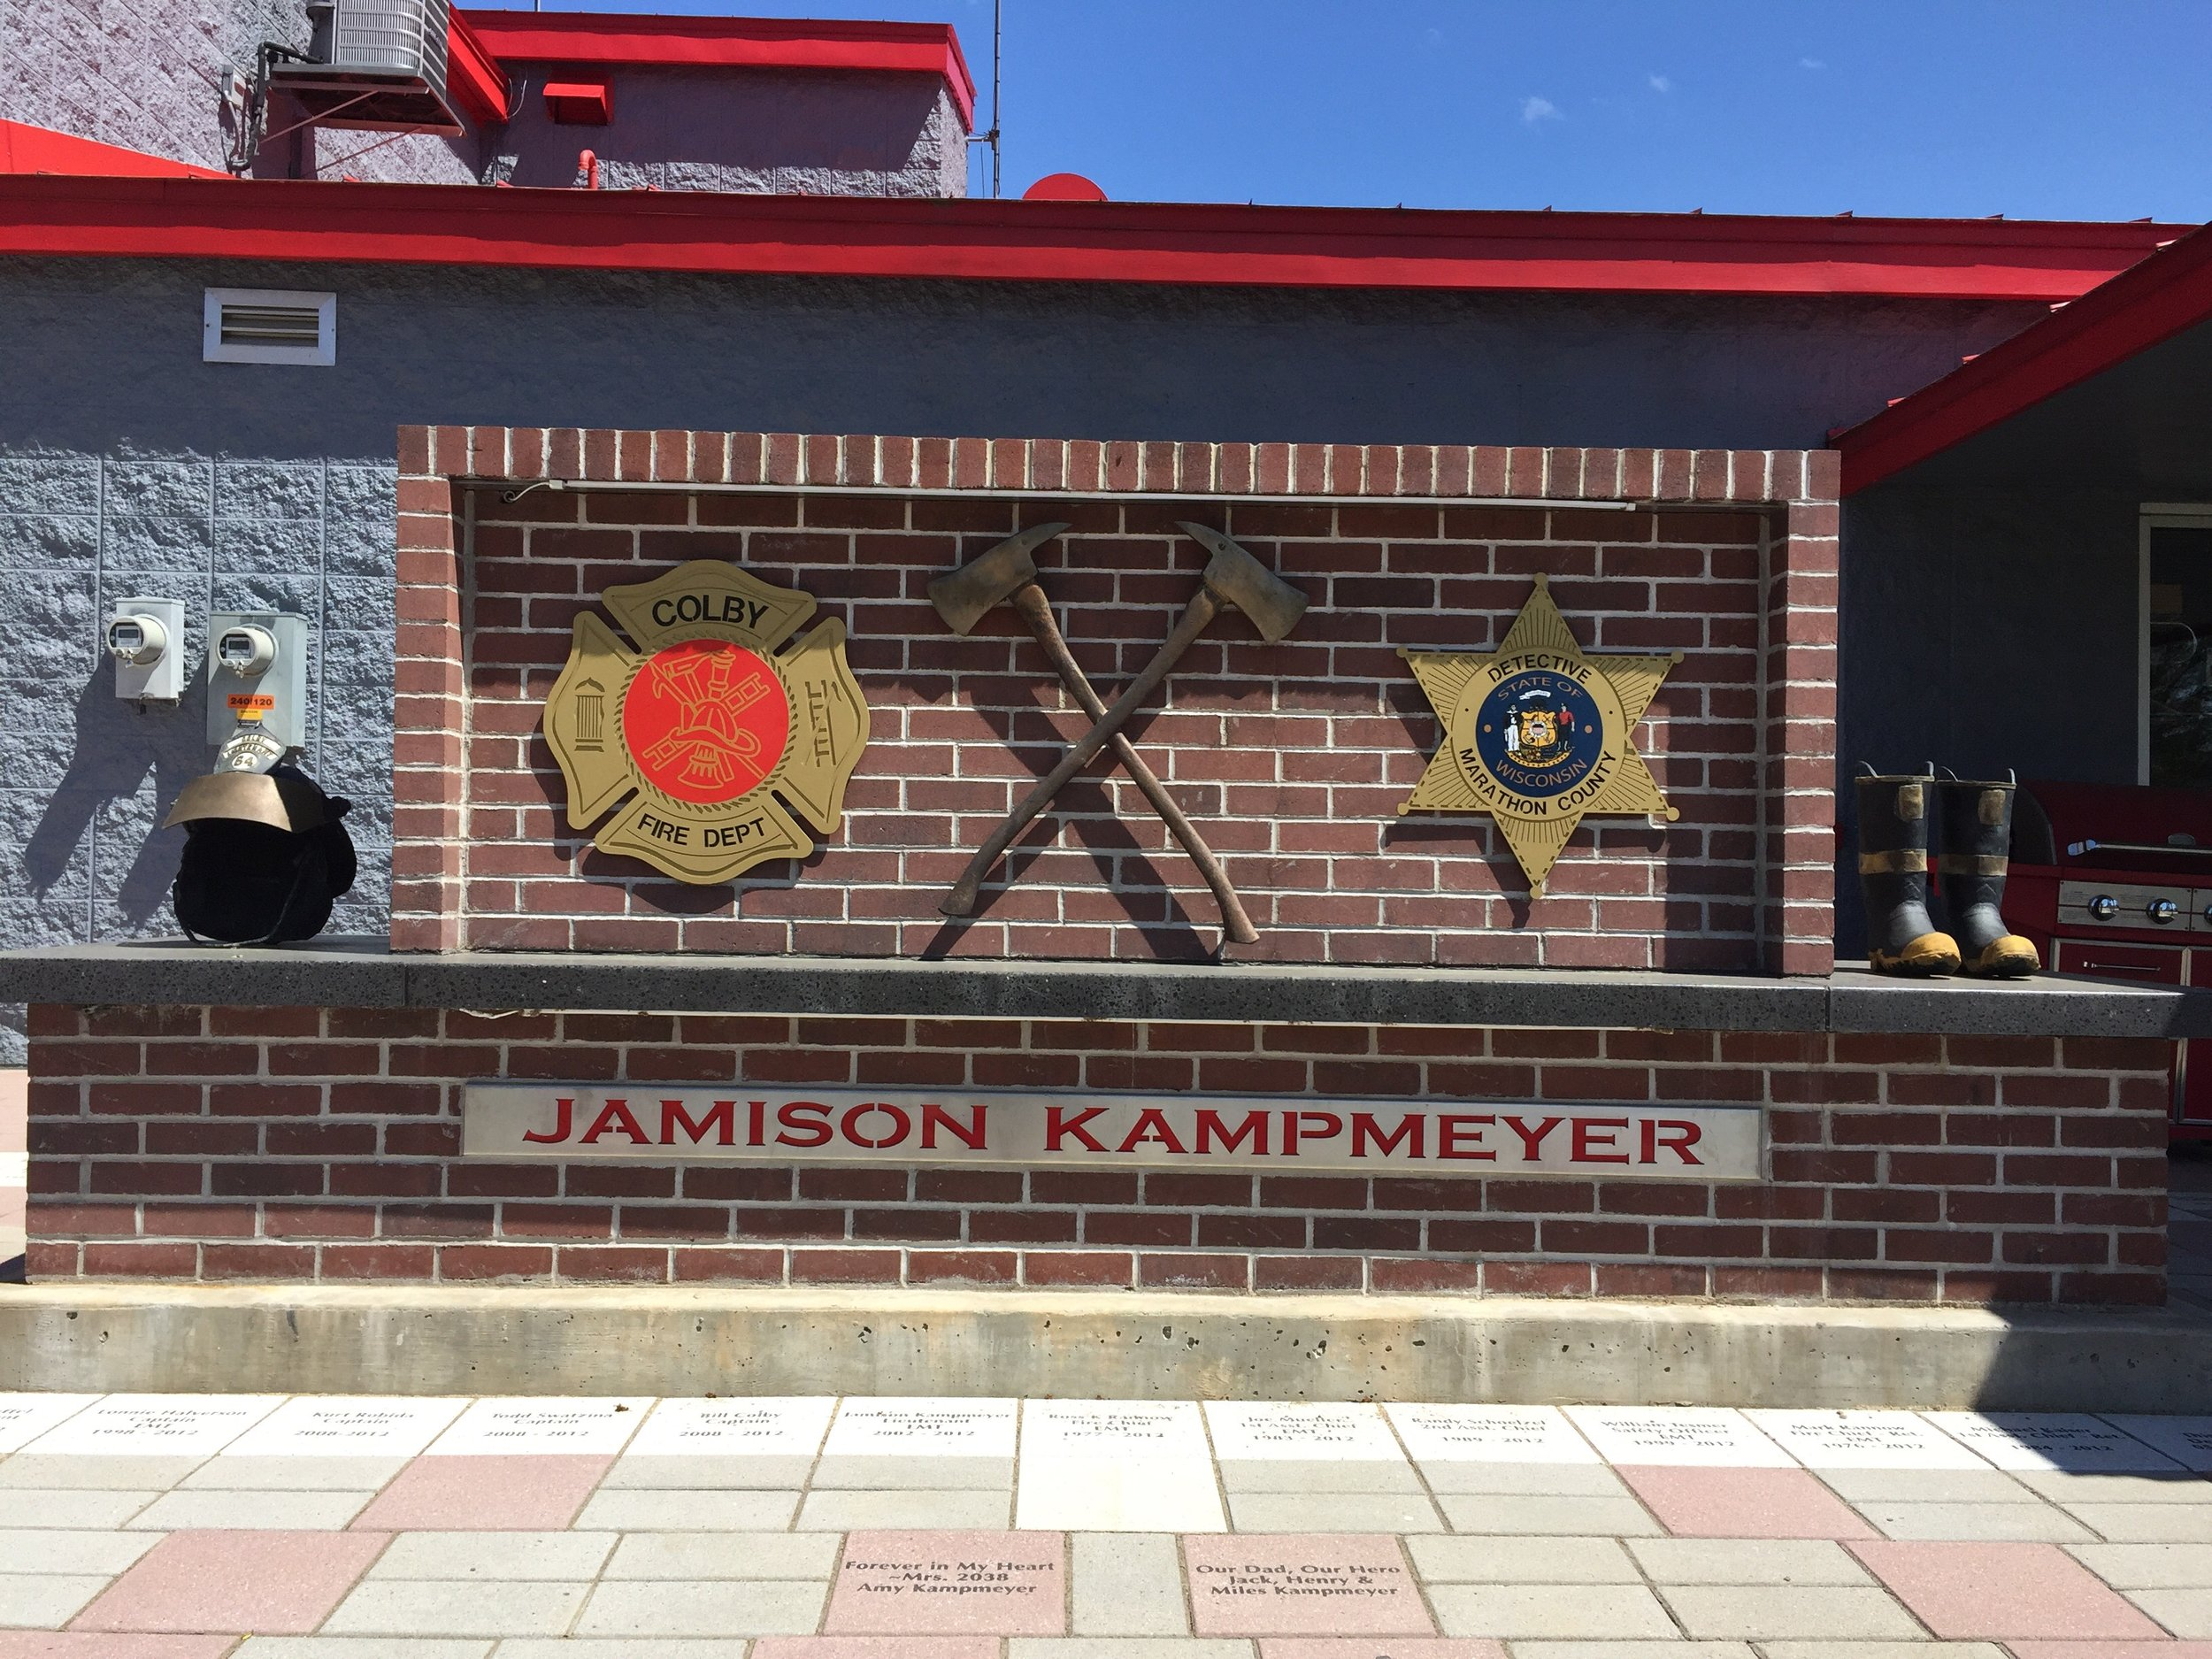 Jamison Kampmeyer Memorial Wall, Colby, WI